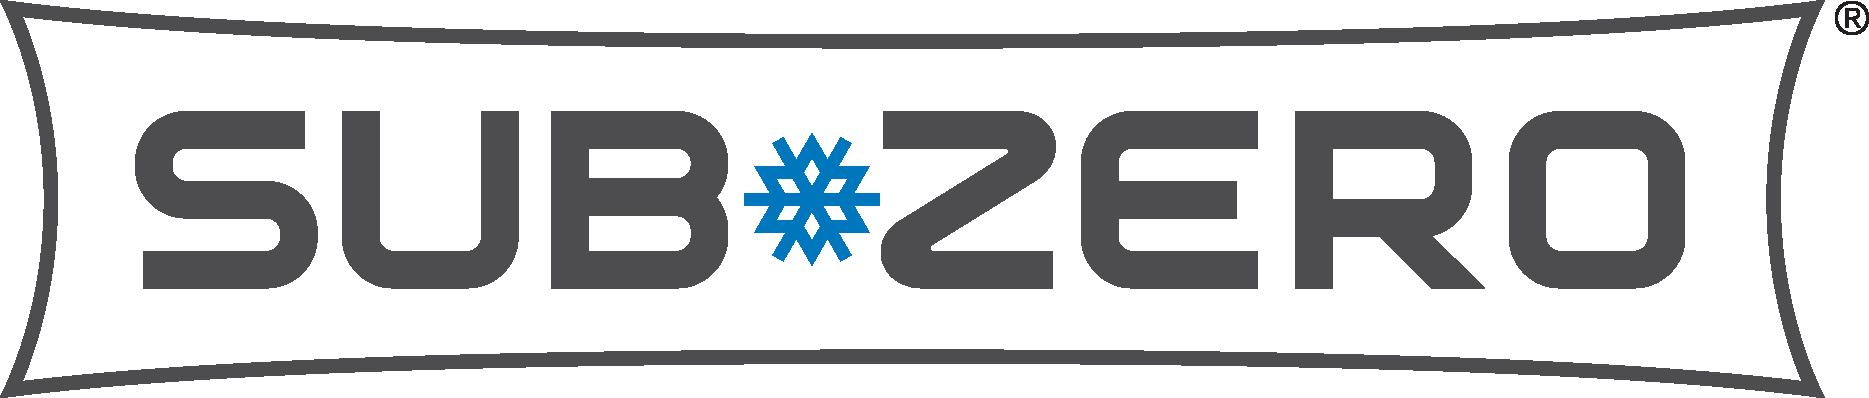 Sub-Zero Brand Logo